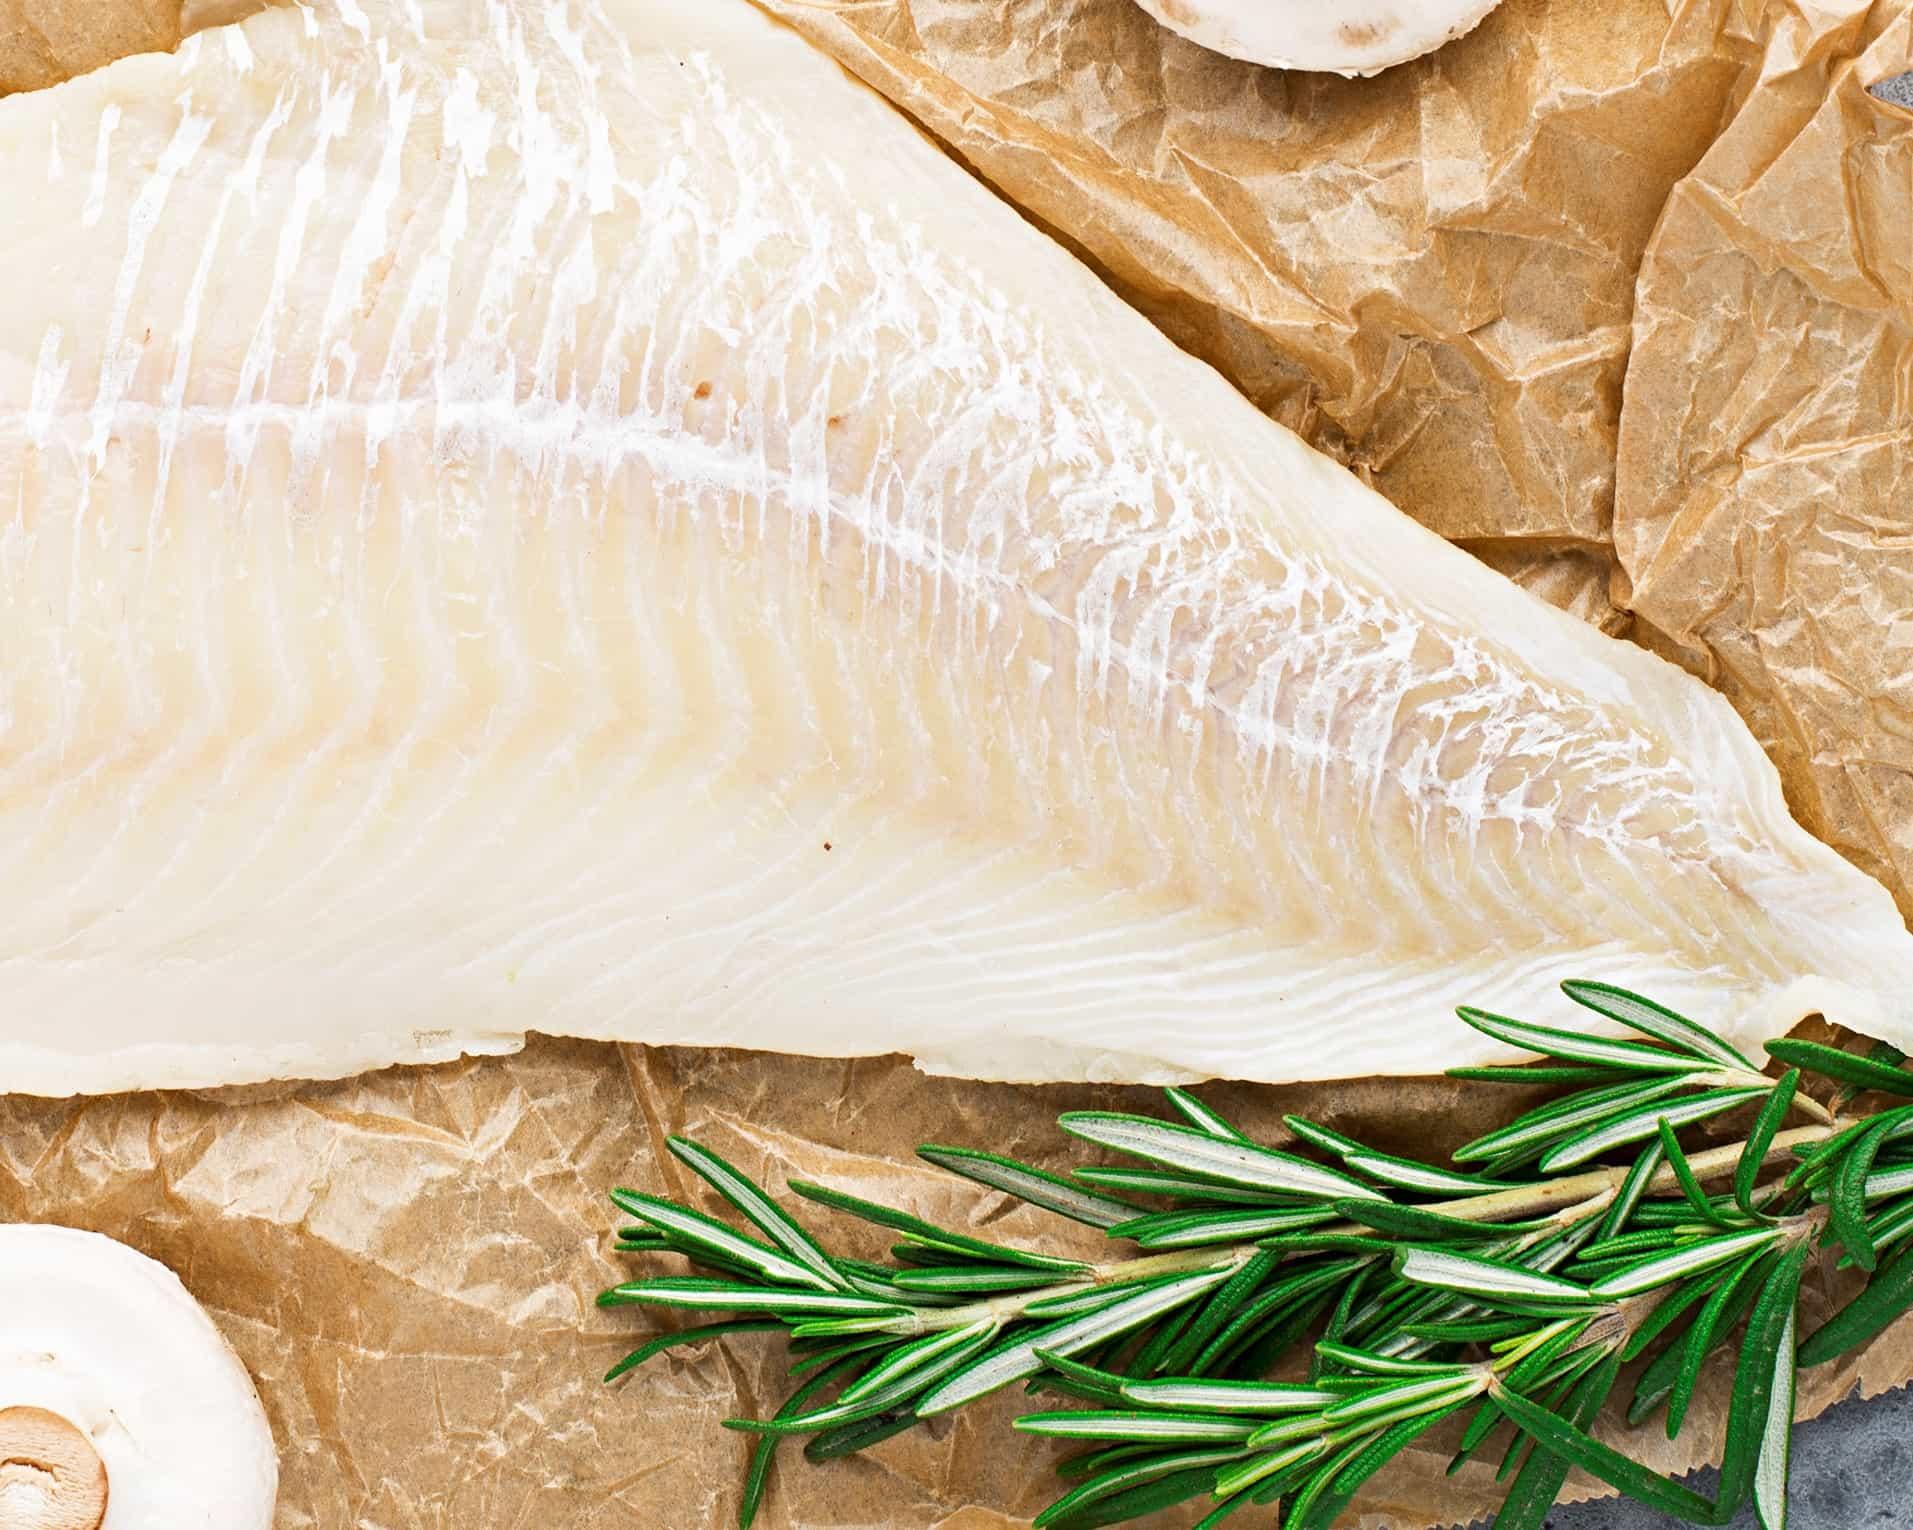 lomo de pescado limpio